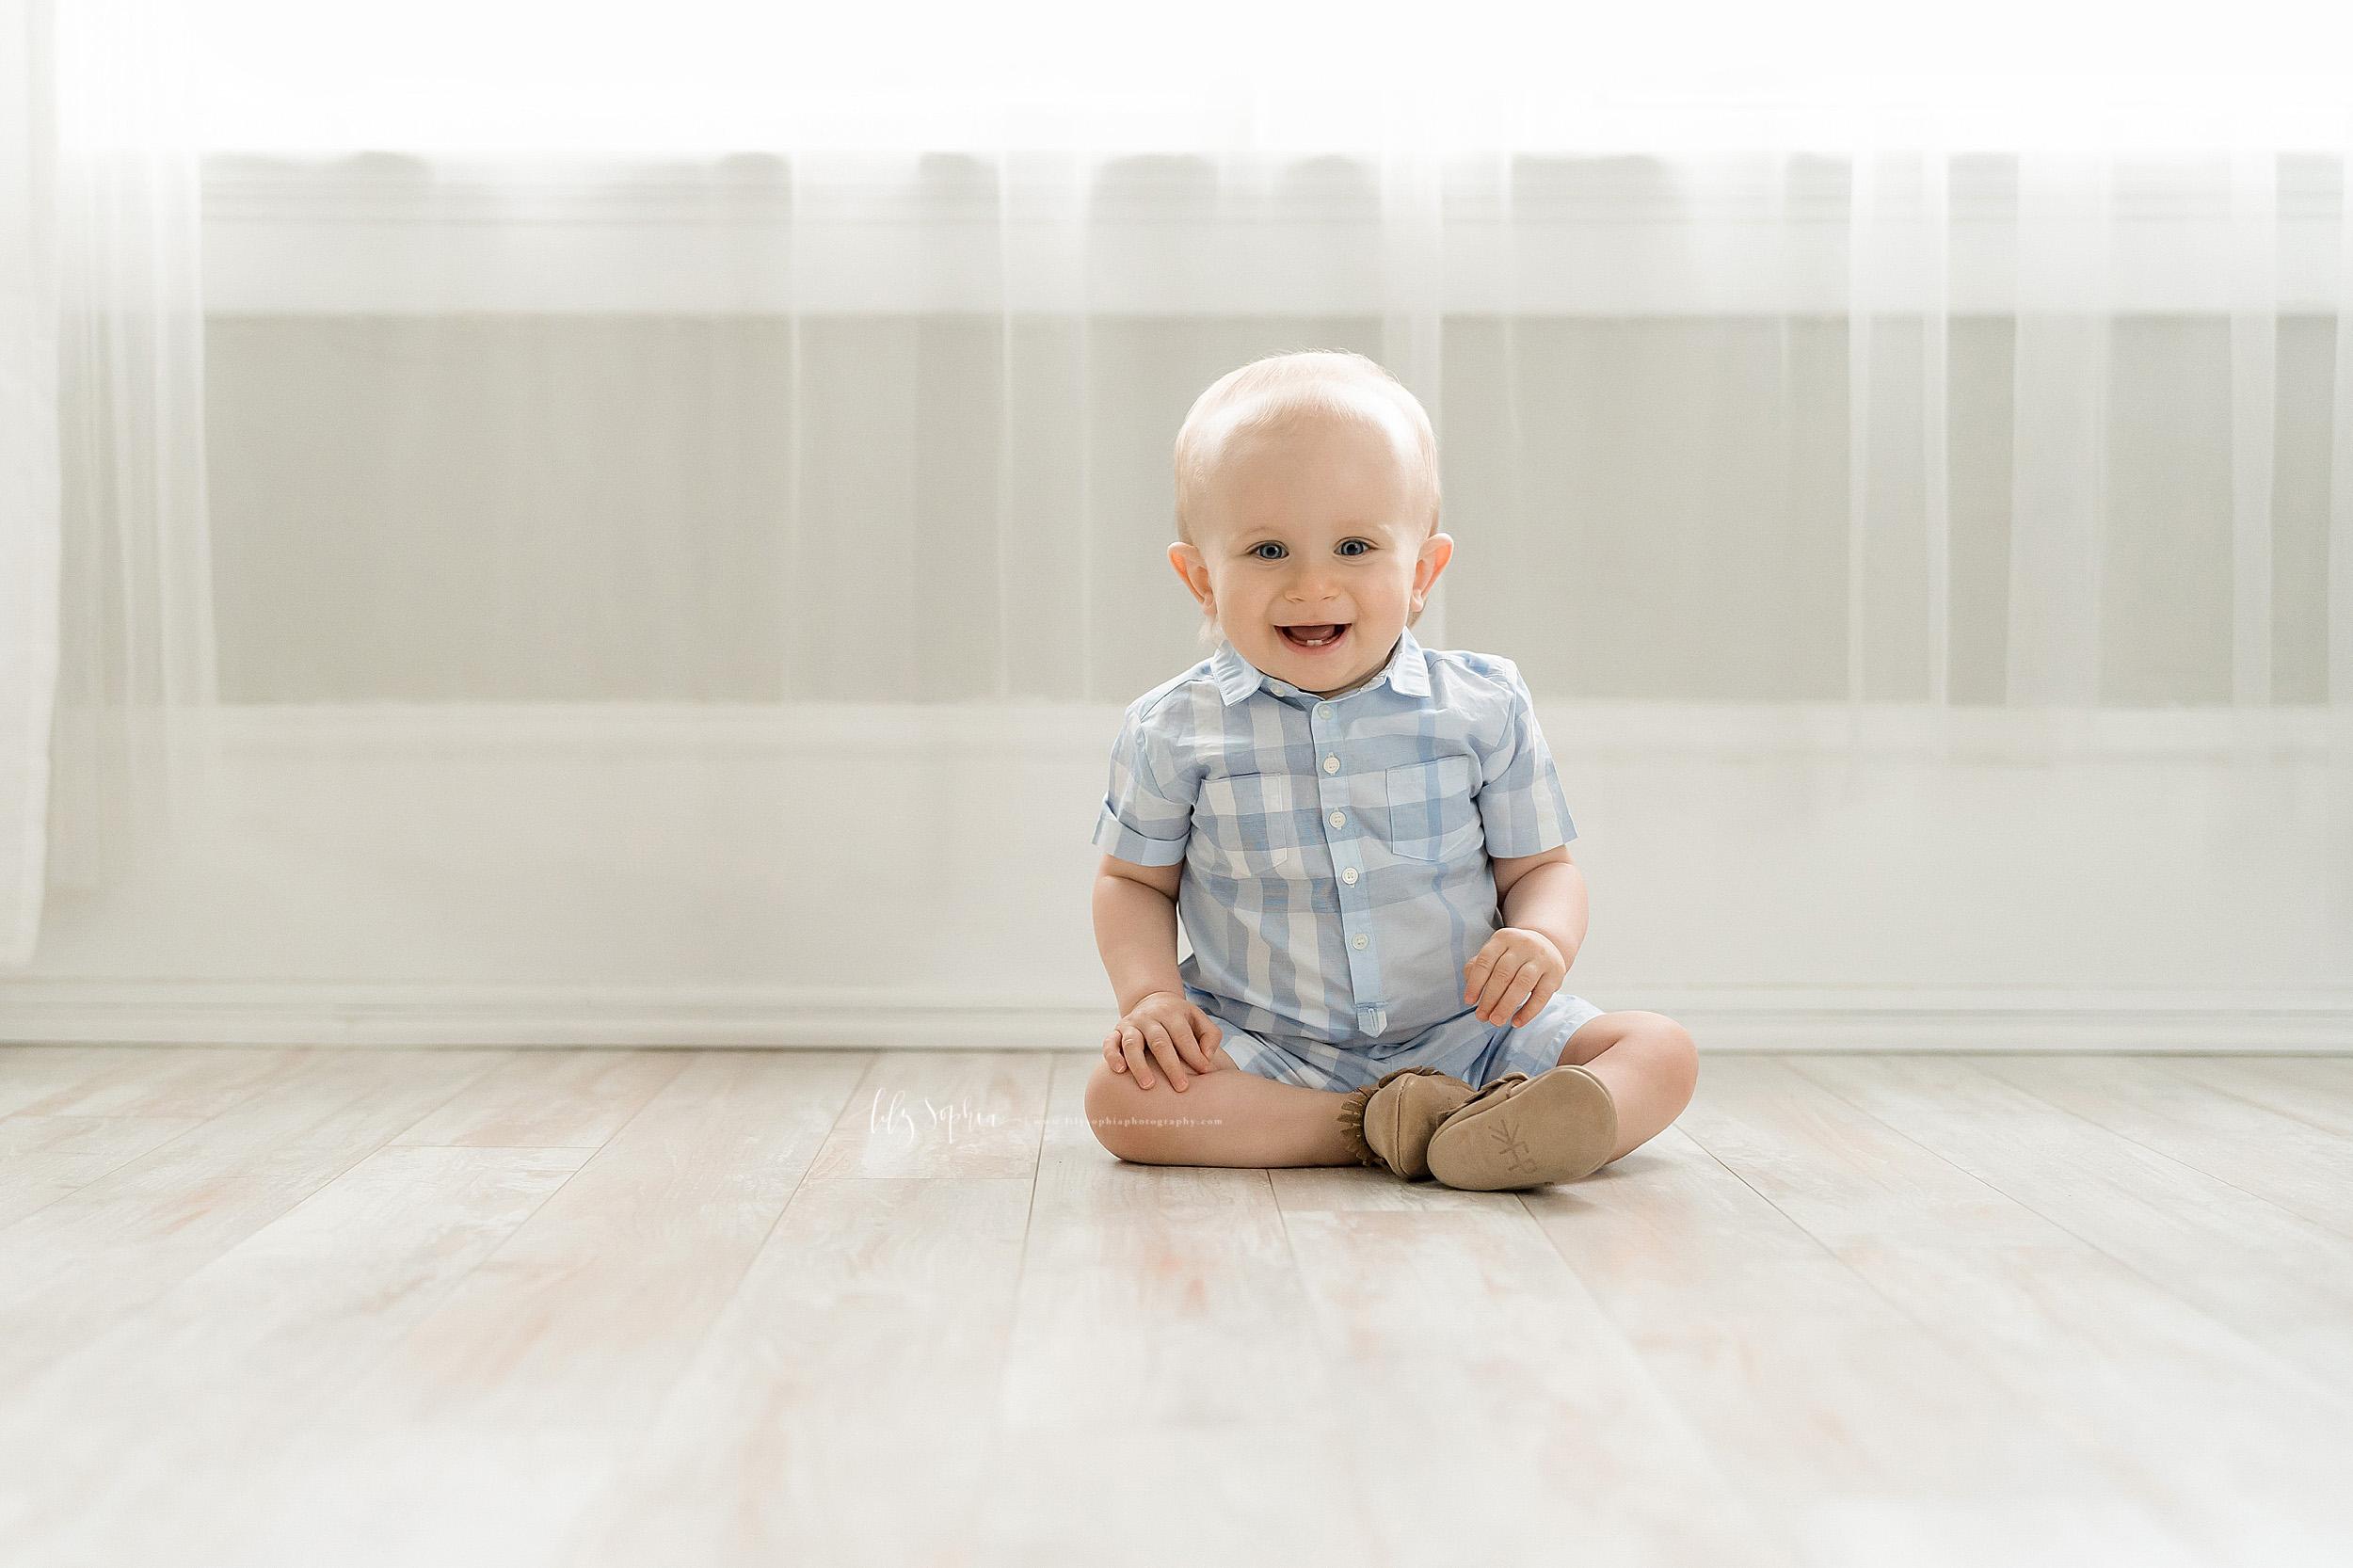 atlanta-brookhaven-alpharetta-sandy-springs-buckhead-virginia-highlands-west-end-decatur-lily-sophia-photography-studio-first-birthday-cake-smash-toddler-baby-boy-family-photos_1138.jpg